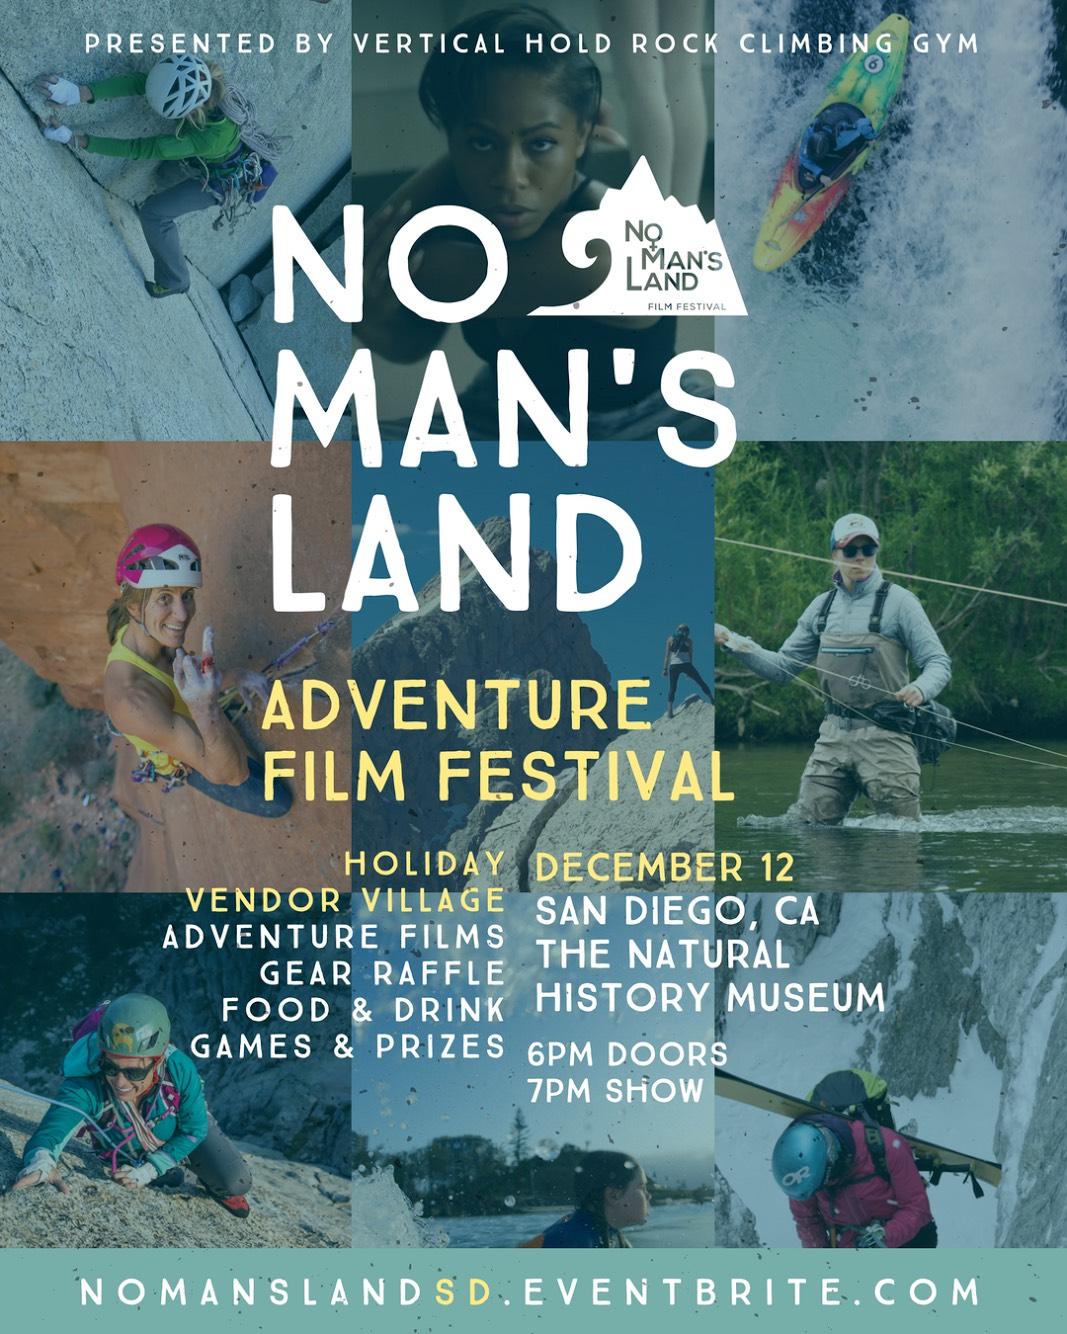 No mans land film festival